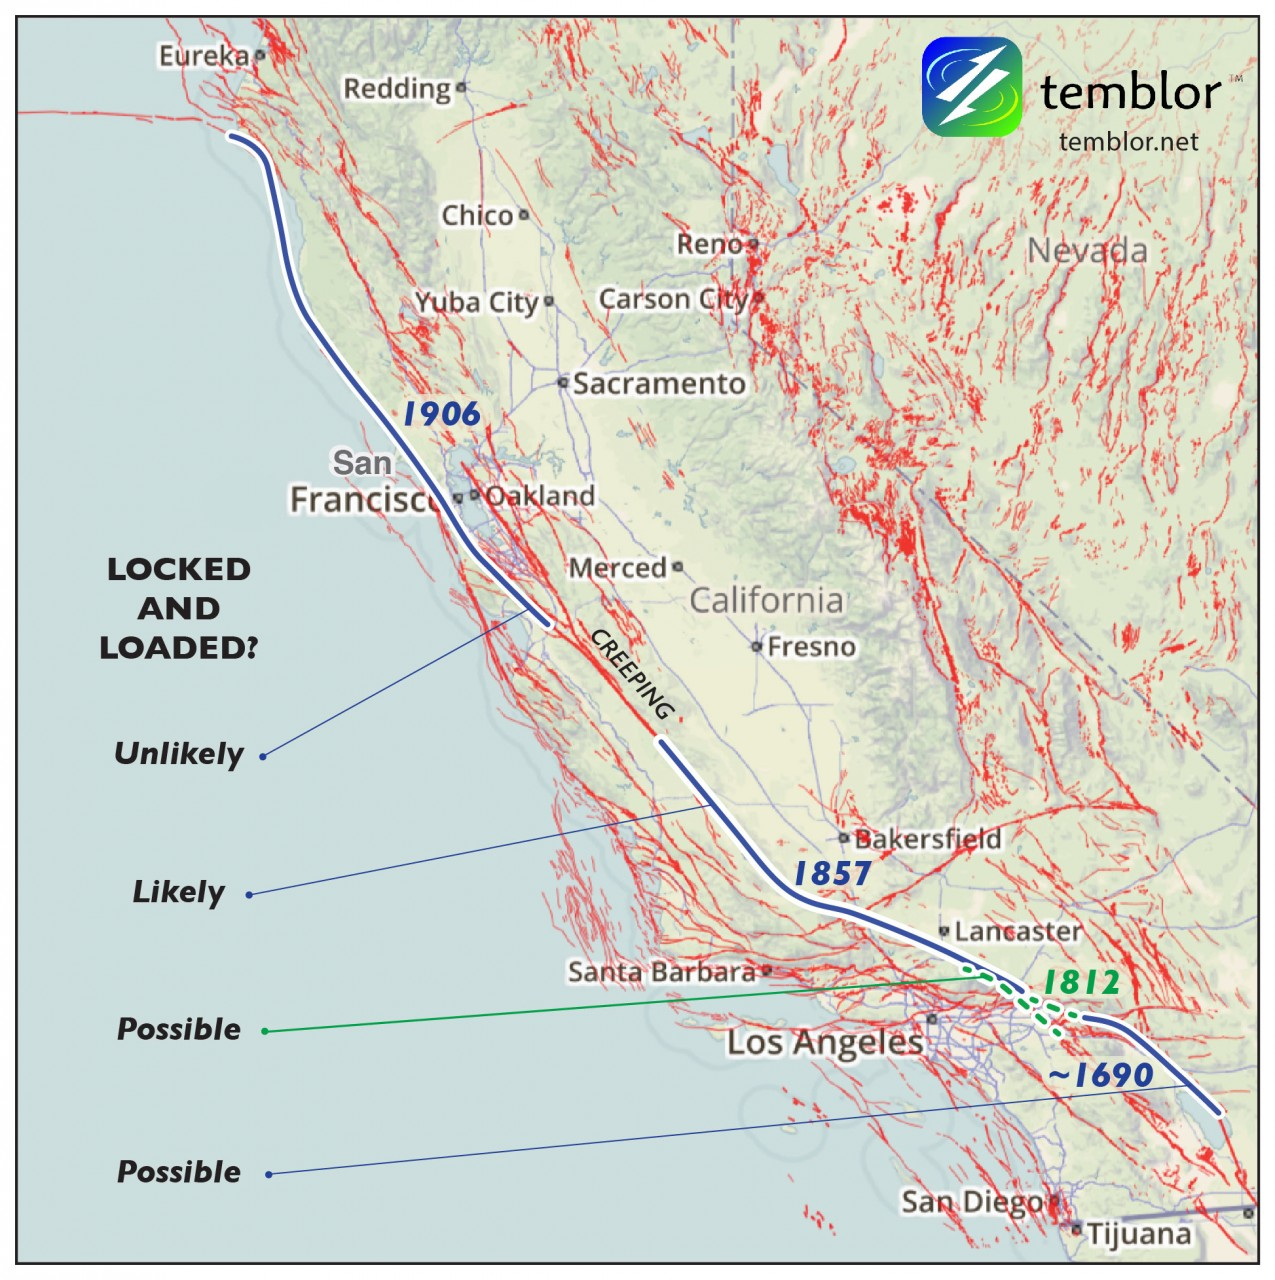 temblor-san-andreas-fault-map.jpg